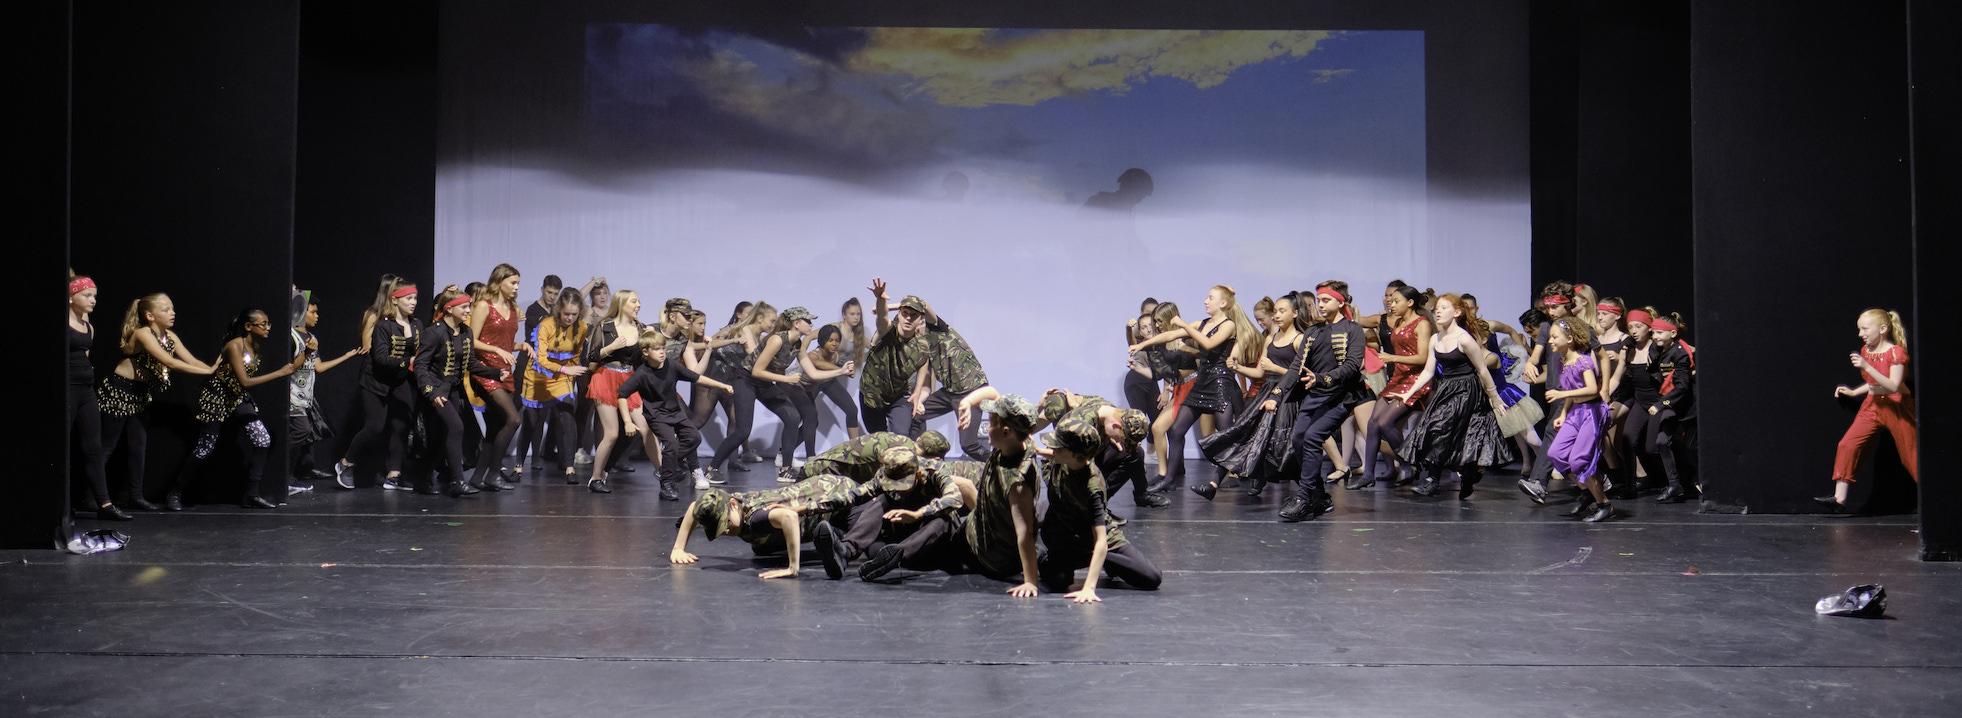 Leatherhead theatre production